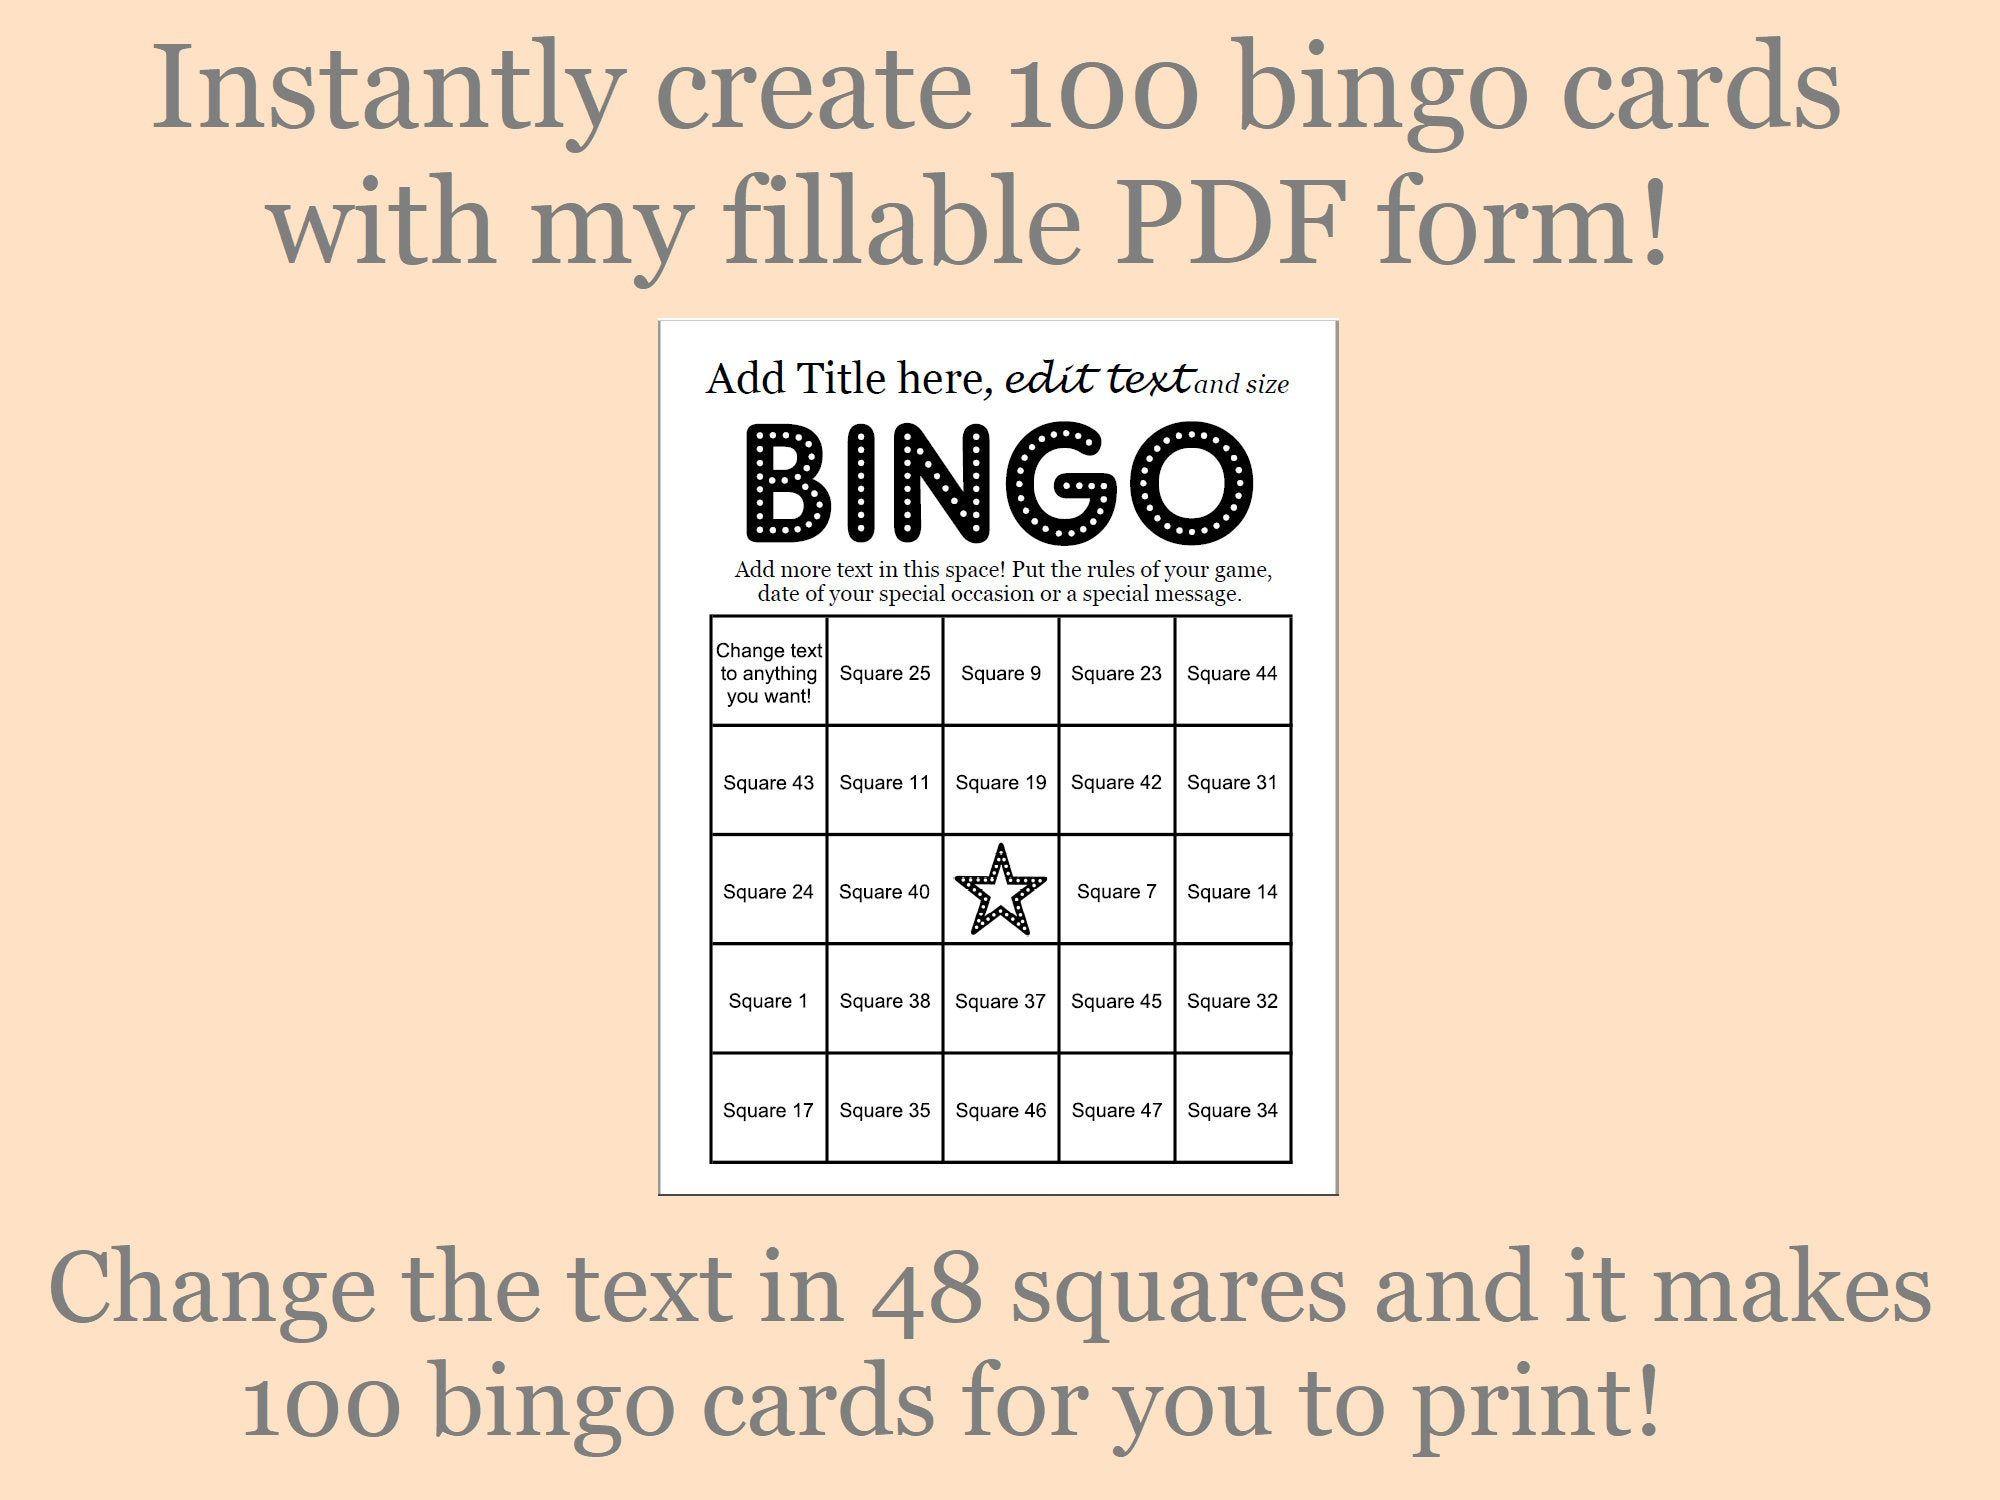 Bingo Card Maker Makes 100 Custom Bingo Cards 48 Call Items